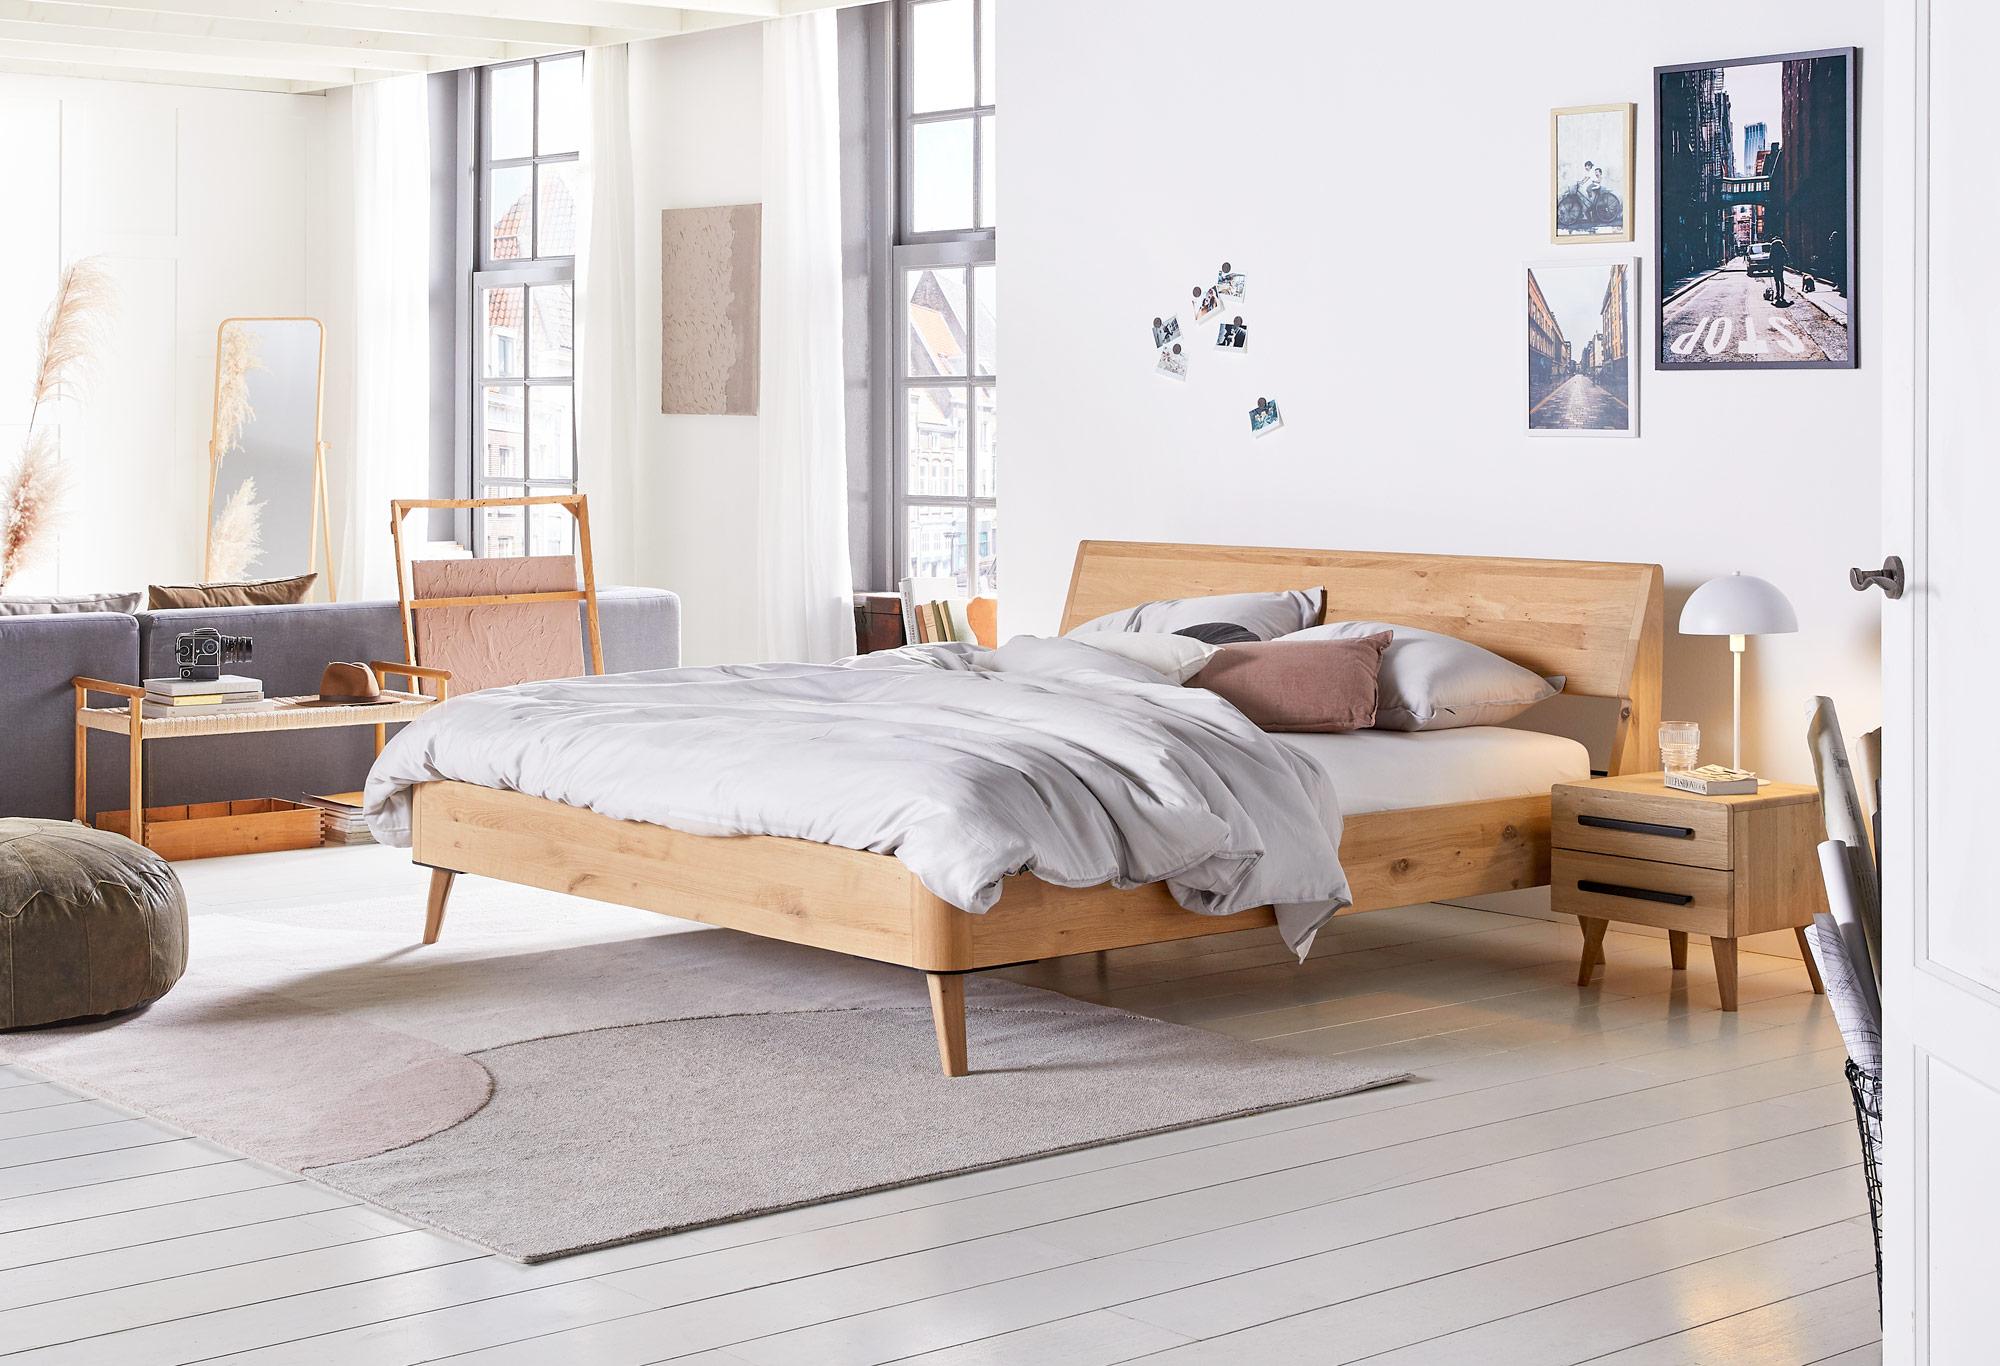 Bedframe Balance Tender| Swiss Sense